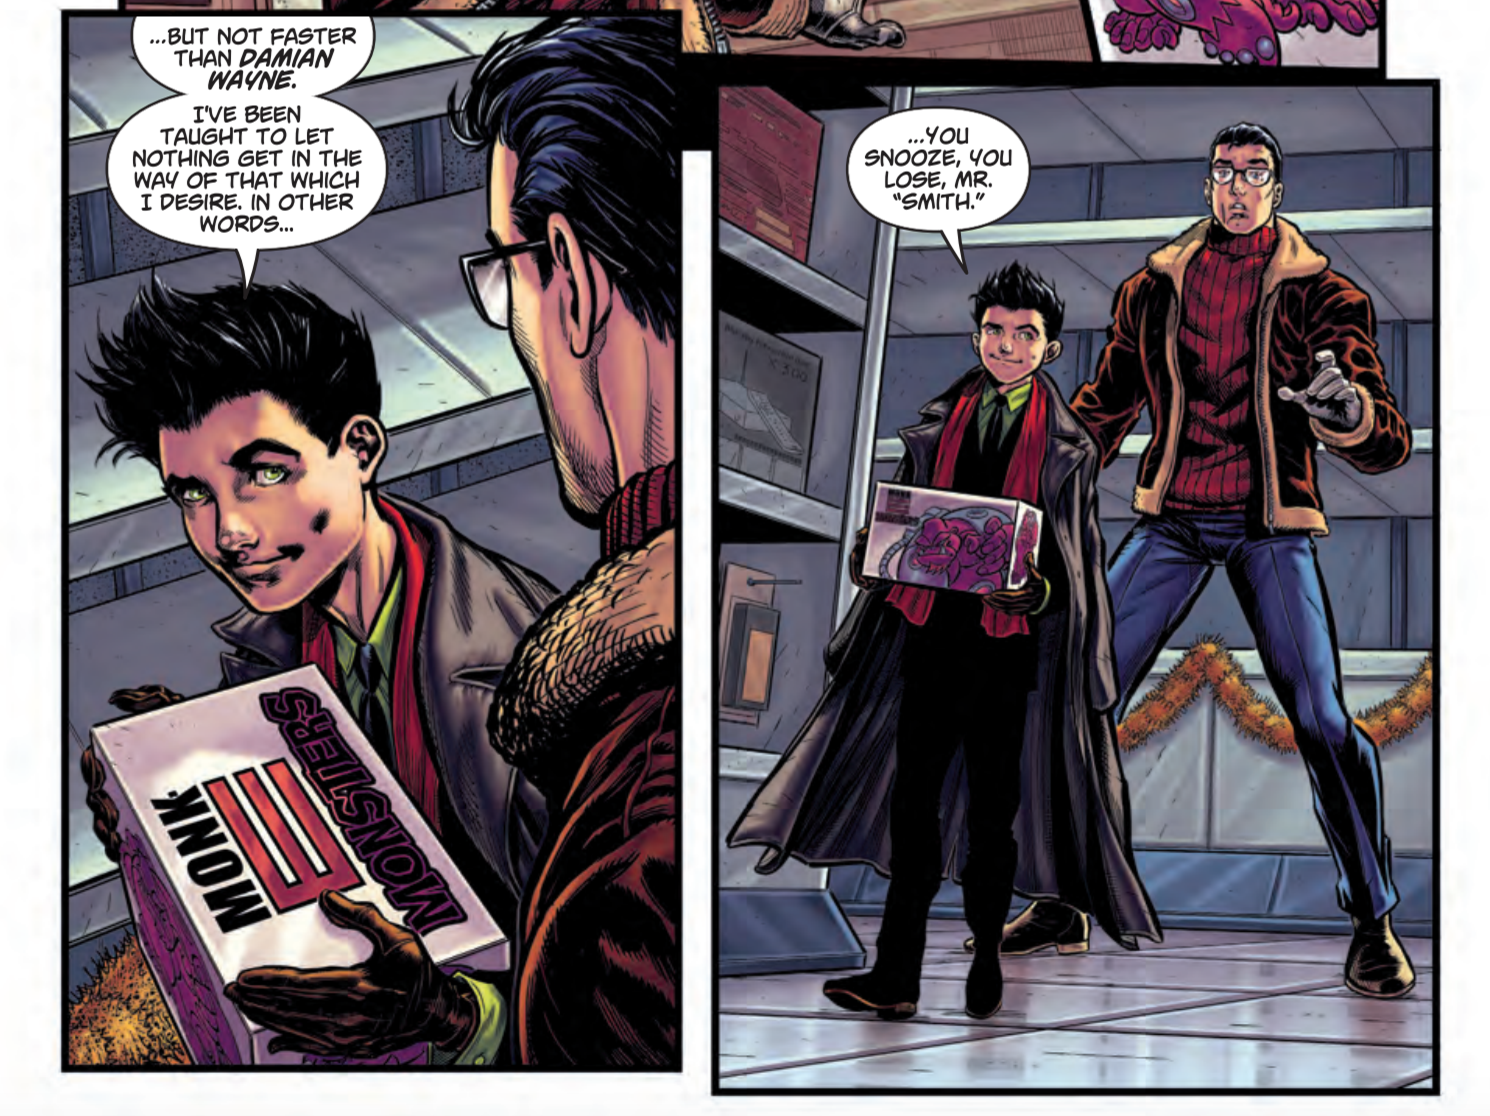 DC Comics Just Released a Superman 'Jingle All the Way' Comic ...